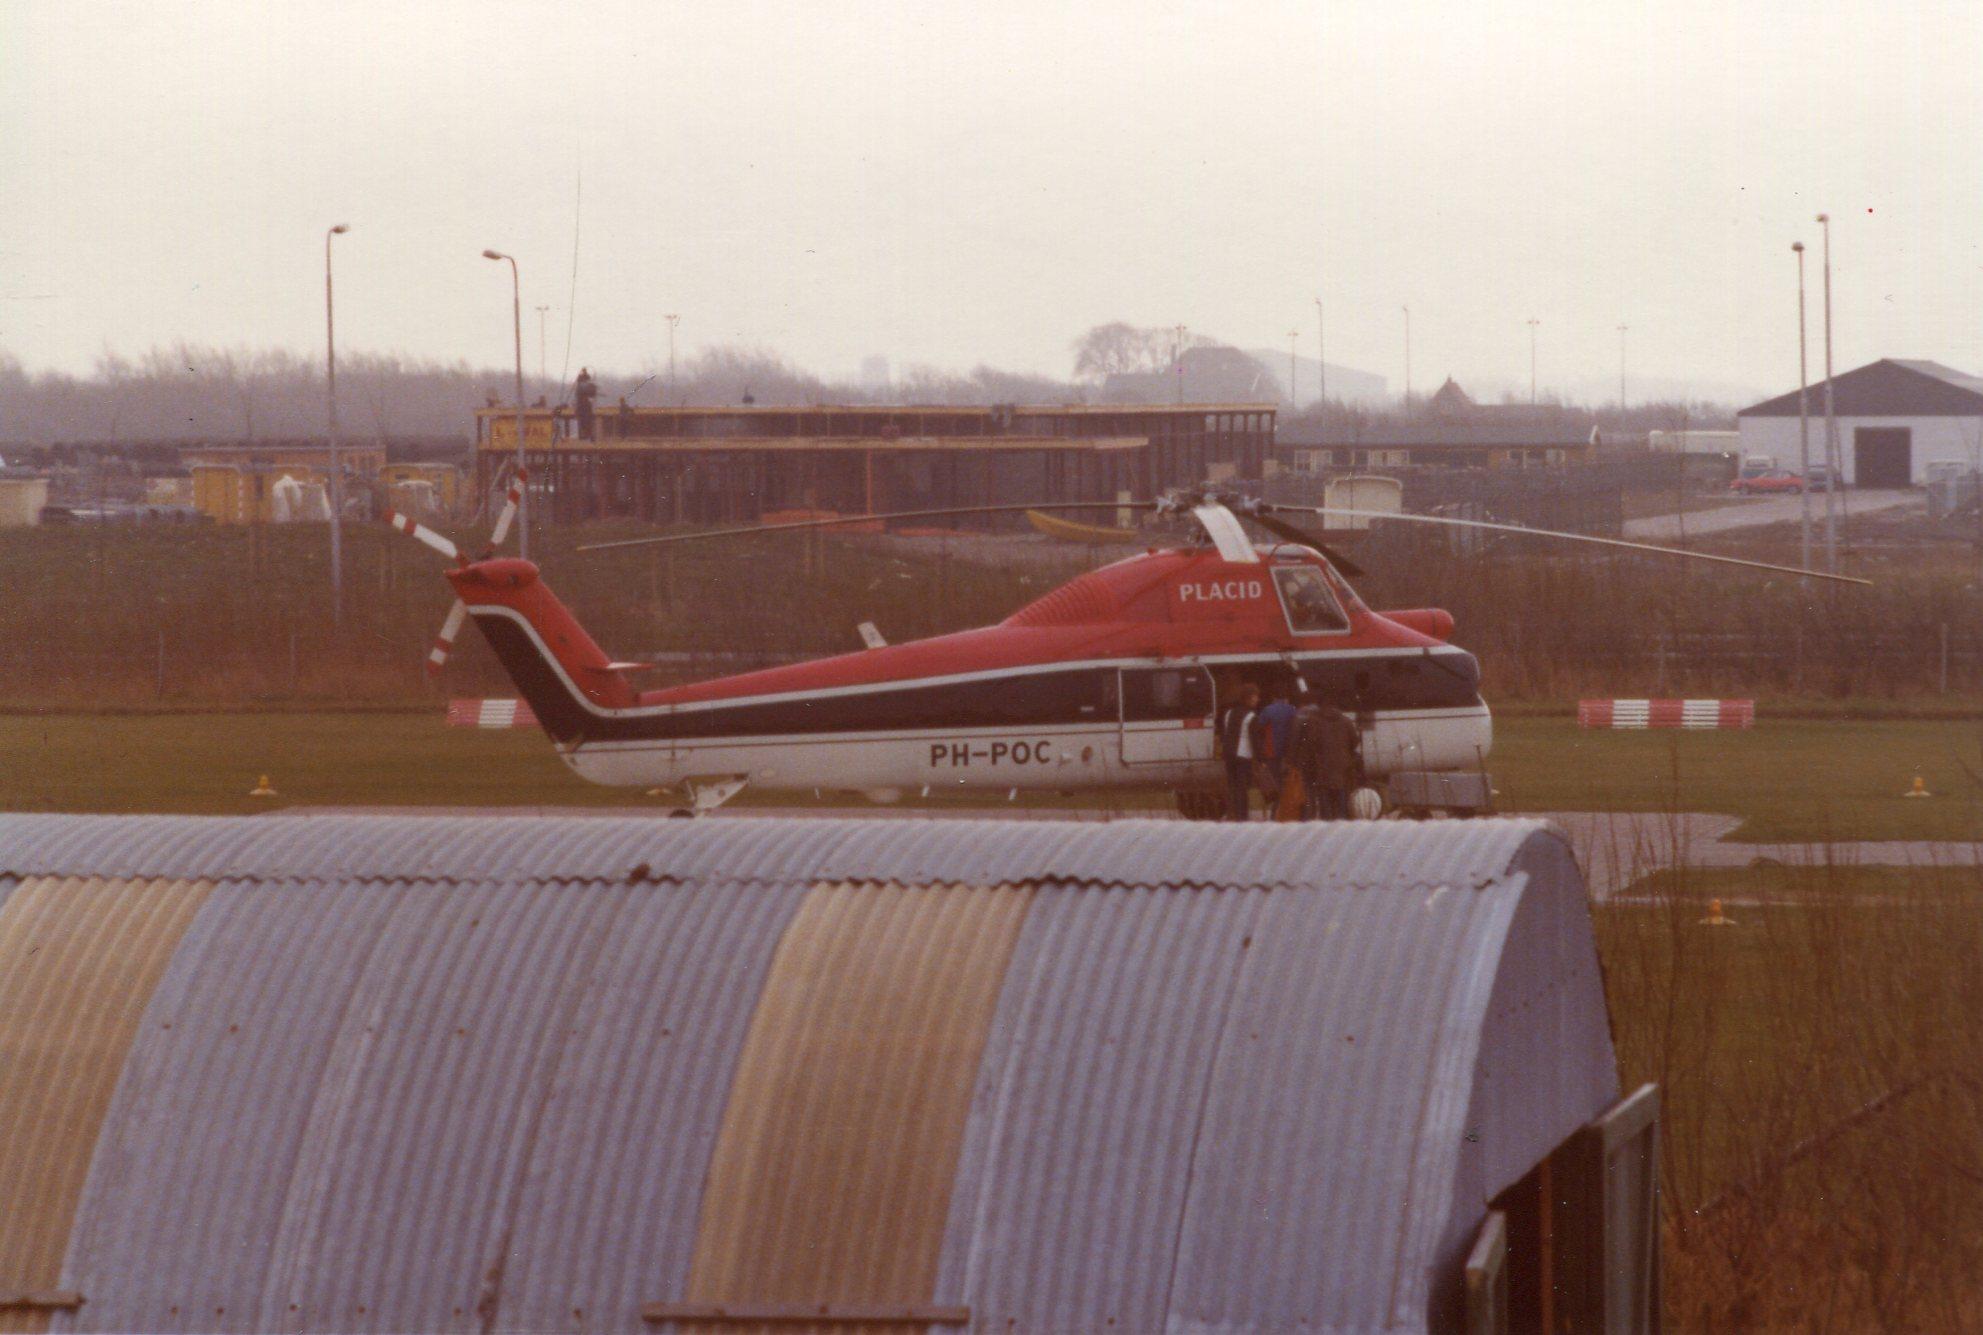 Naam: Den Helder , april 1977 (2).jpg Bekeken: 446 Grootte: 271,9 KB